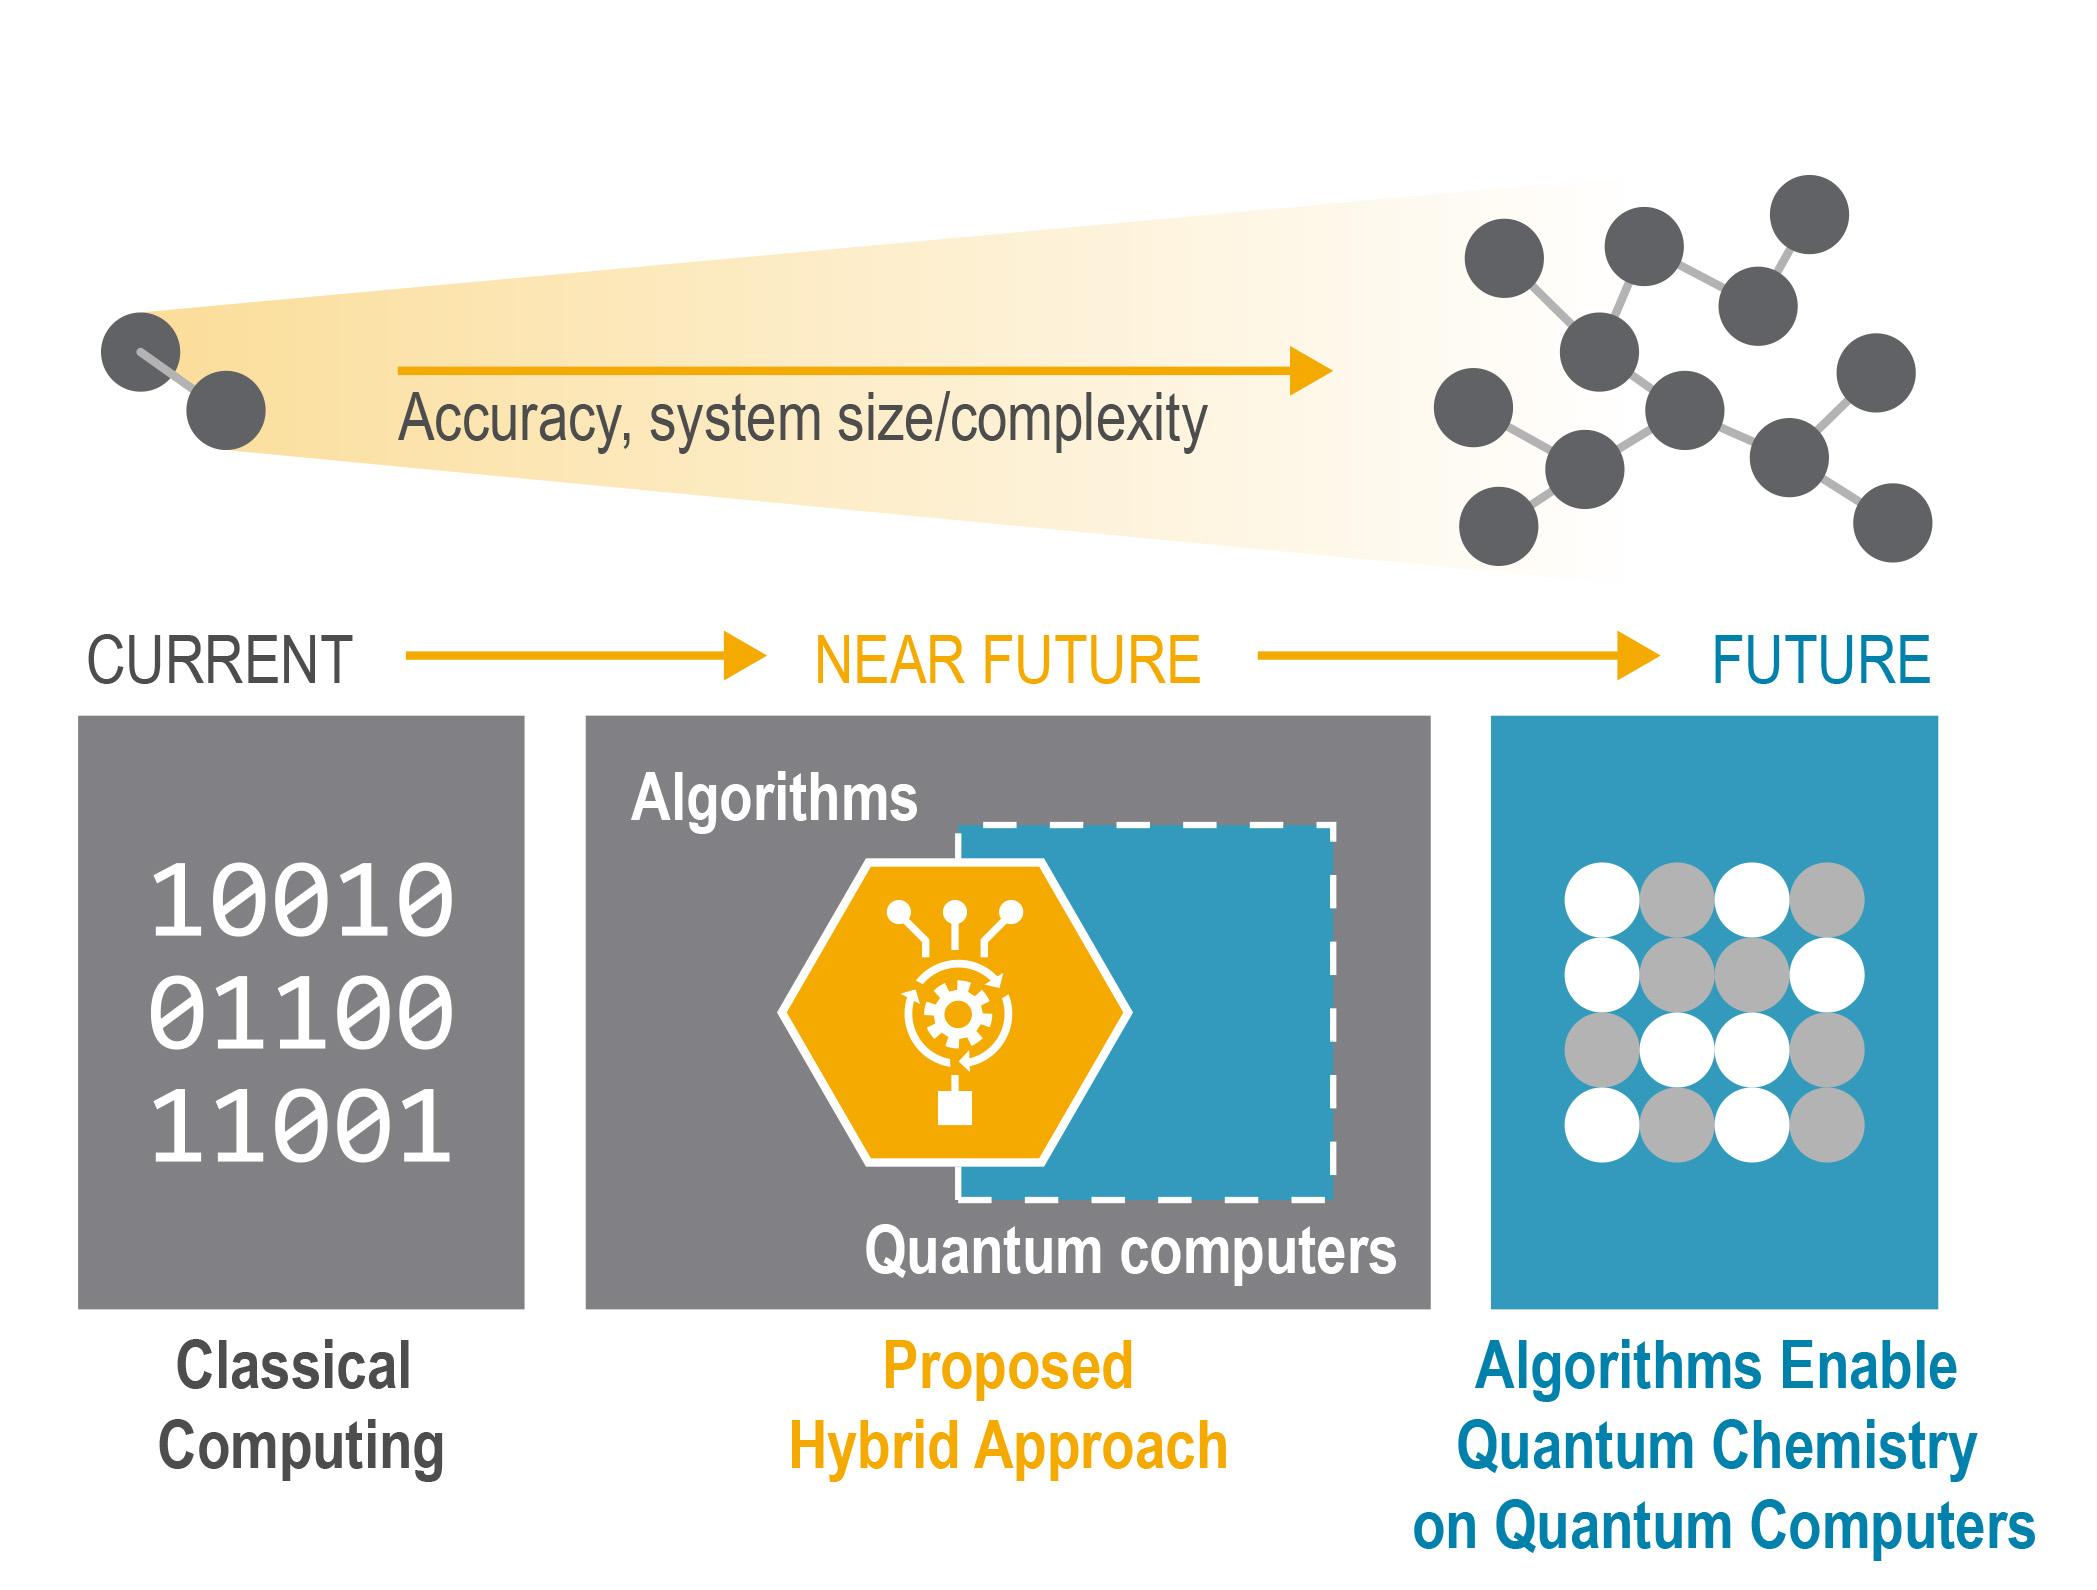 PNNL: News - PNNL's capabilities in quantum information